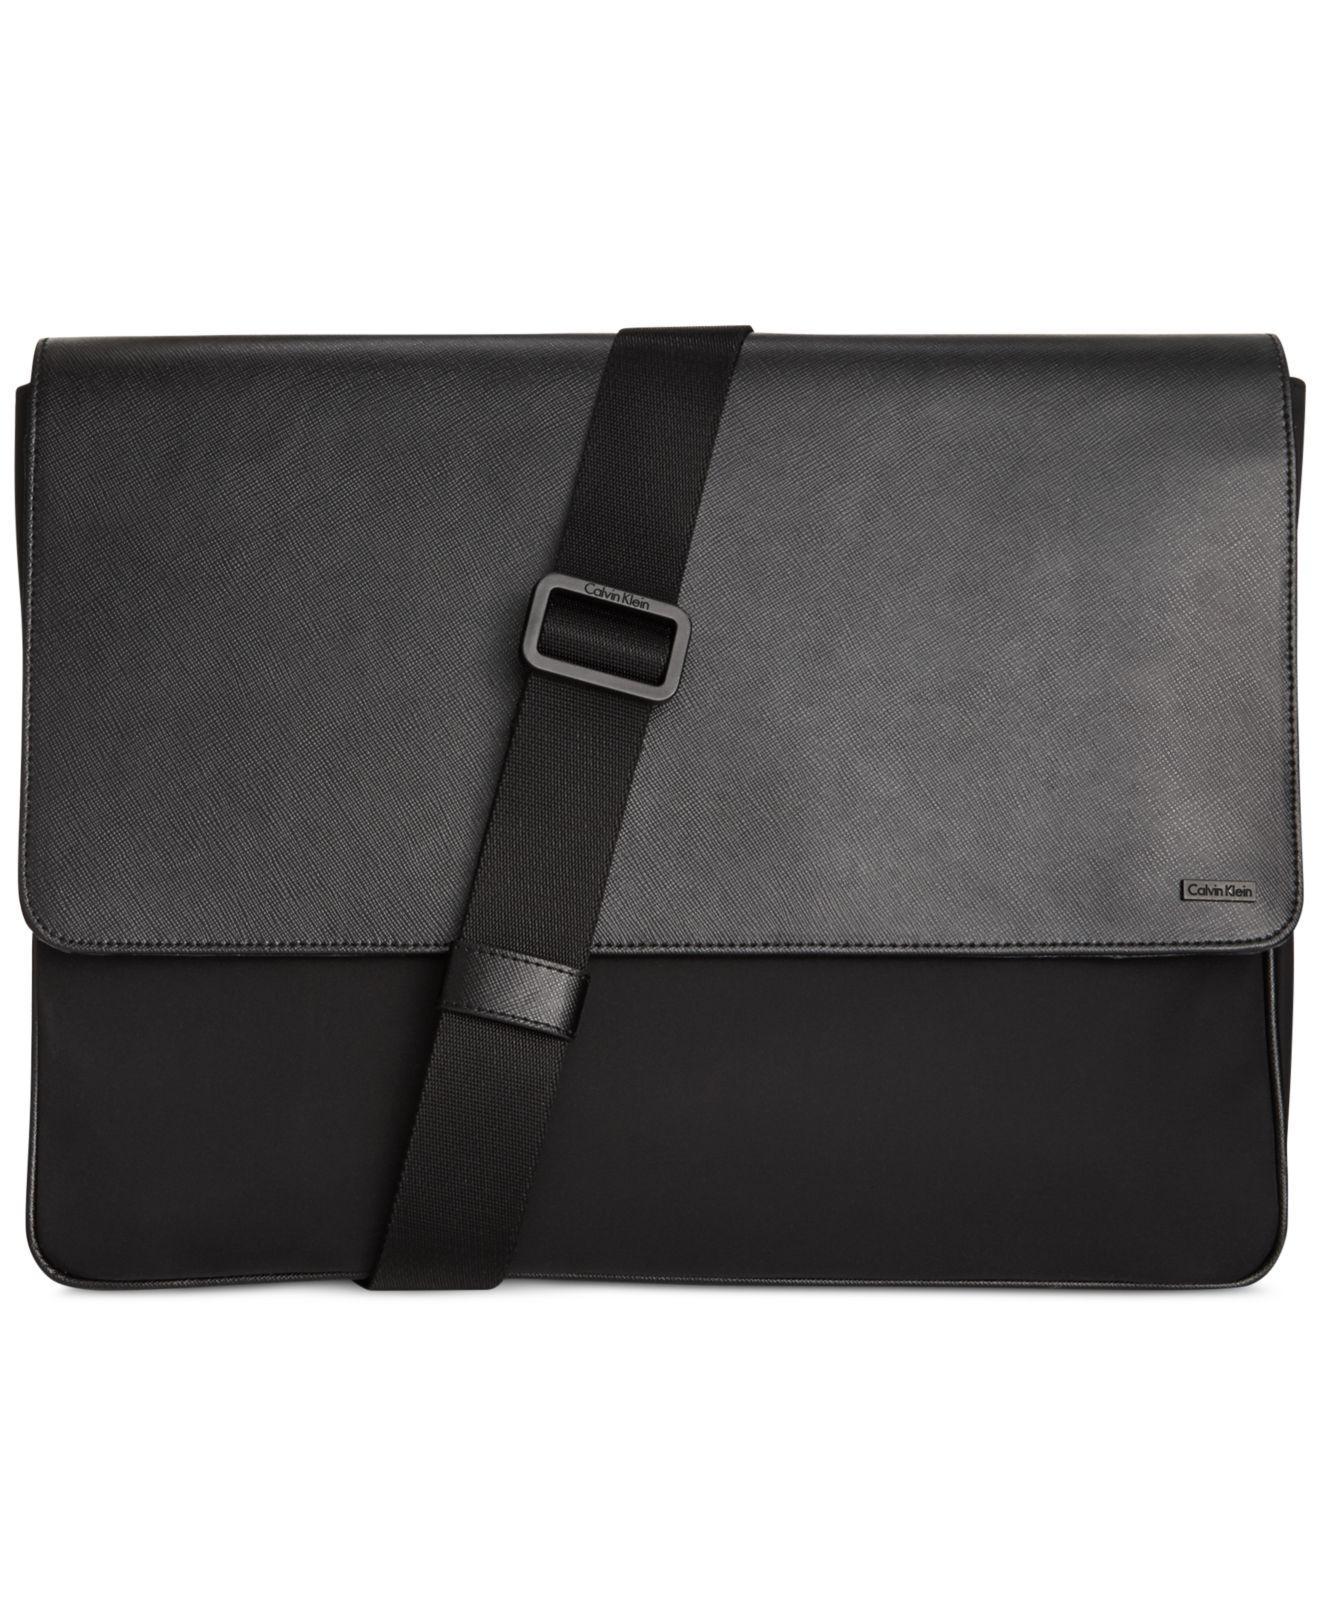 Embossed leather shoulder bag CALVIN KLEIN 205W39NYC rhd2Q